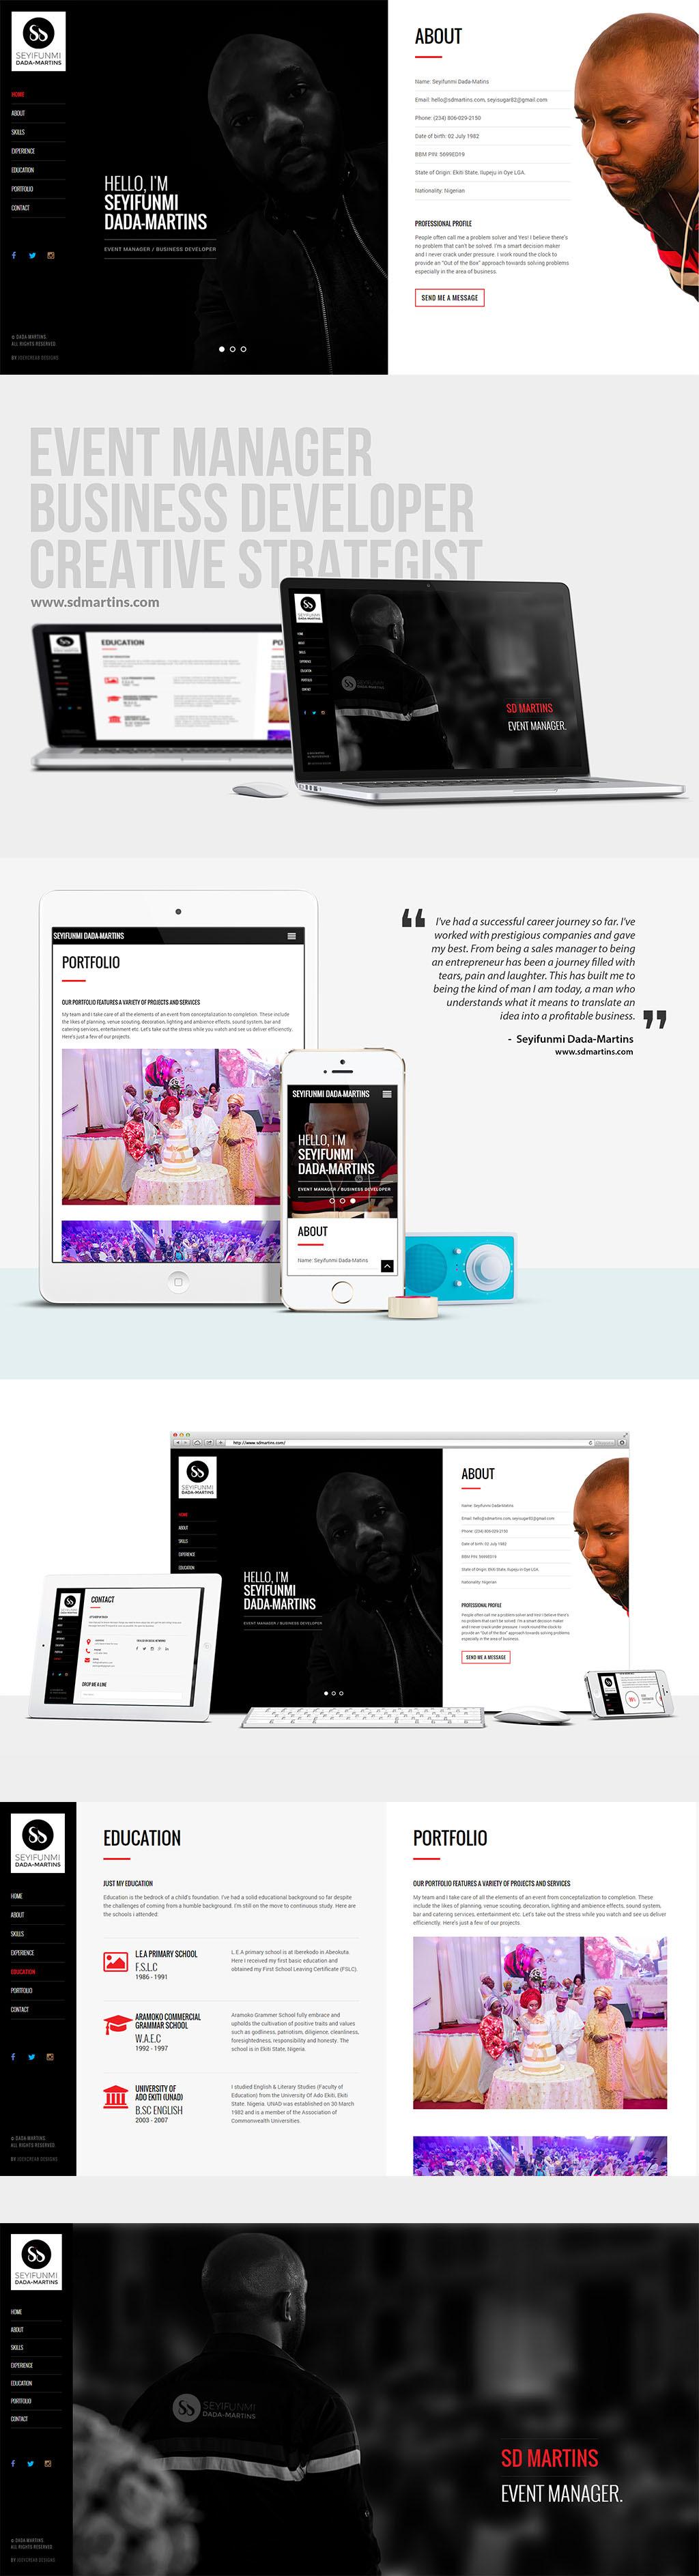 SD Martins Website Design on Behance